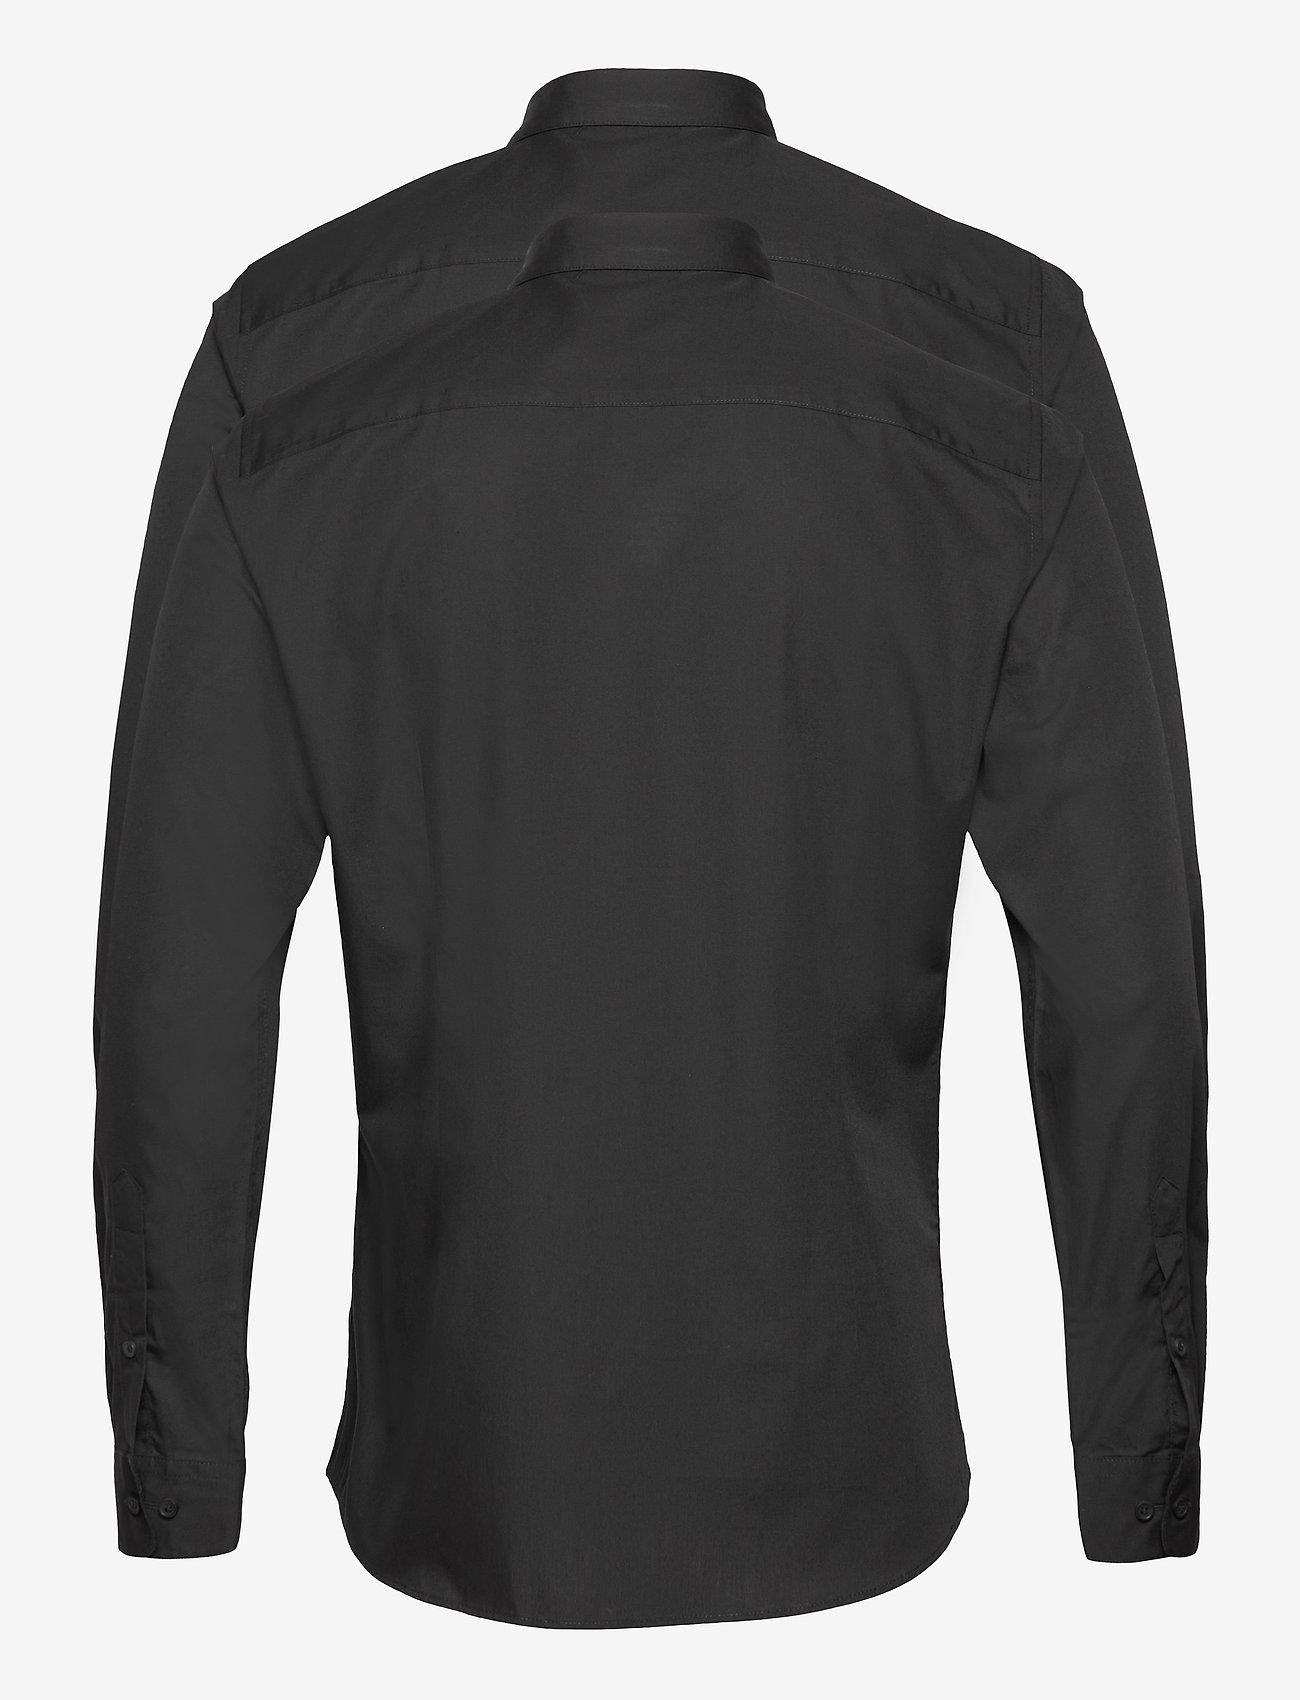 Jack & Jones - JJJOE SHIRT LS 2 PACK - basic skjortor - black - 1